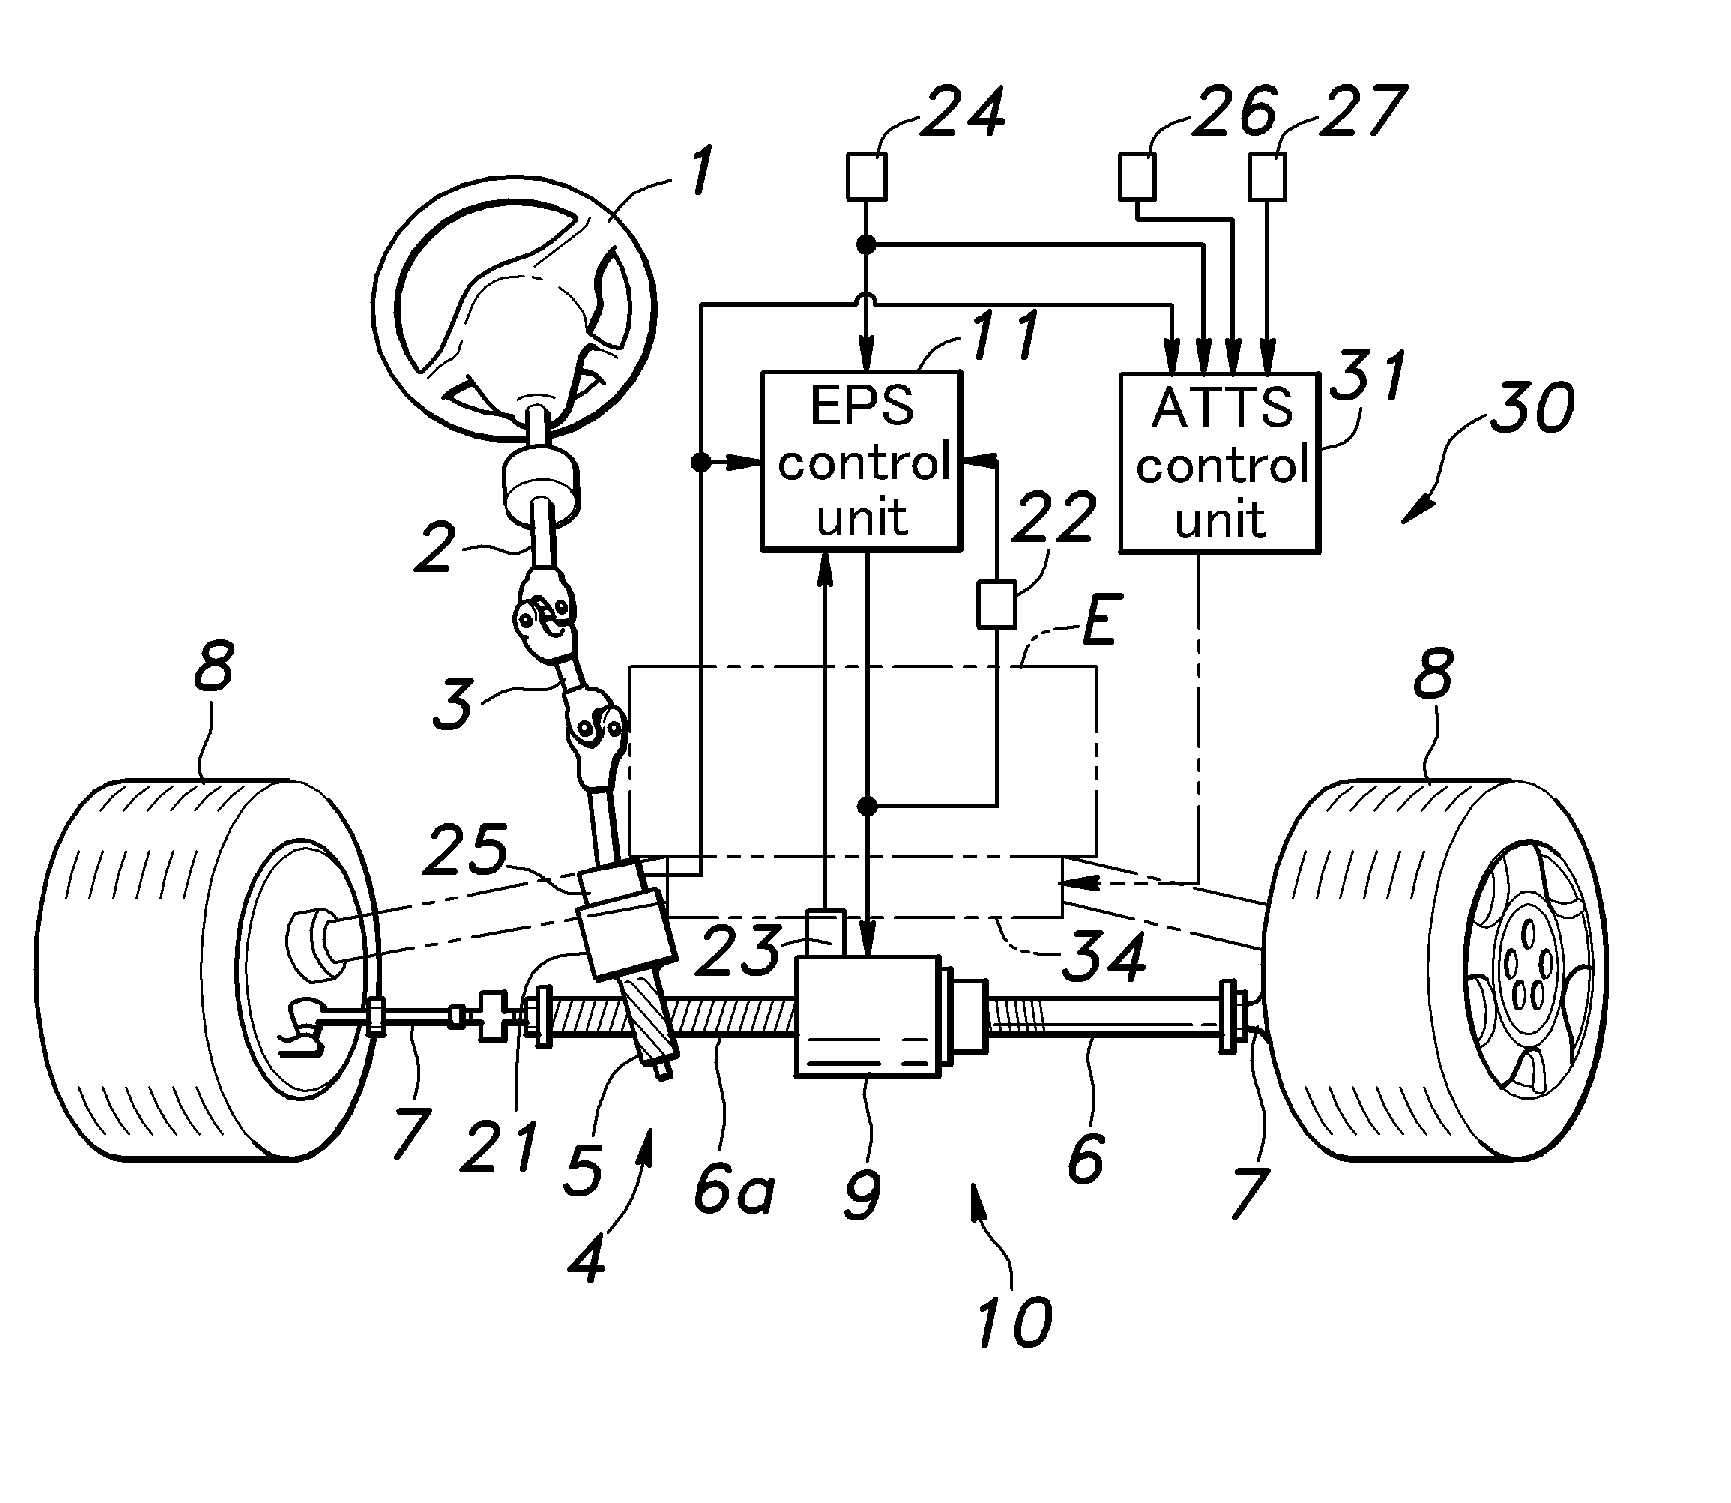 split phase motor diagram moreover single phase motor wiring